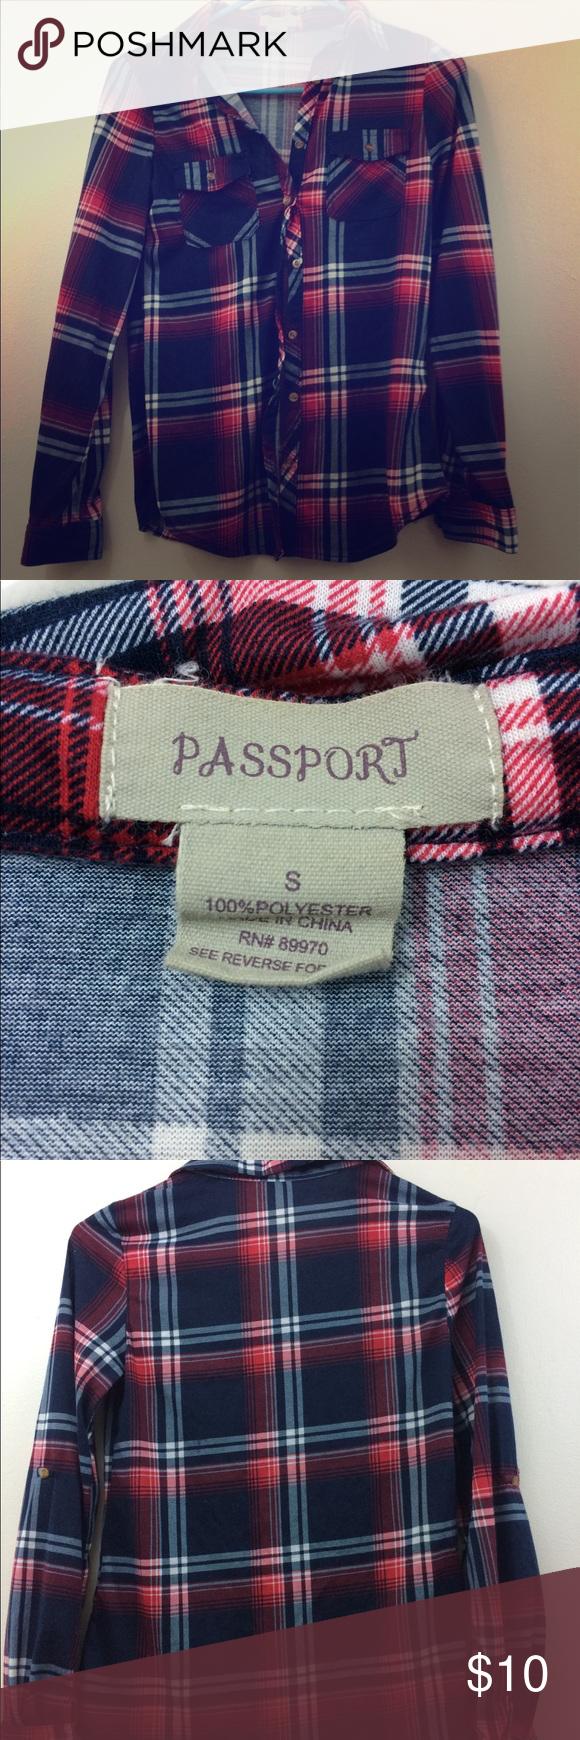 Passport Plaid Shirt Item Passport Plaid Shirt Color Blue Red And White Size Small Details Worn Once And Looks Good F Plaid Shirt Plaid Colorful Shirts